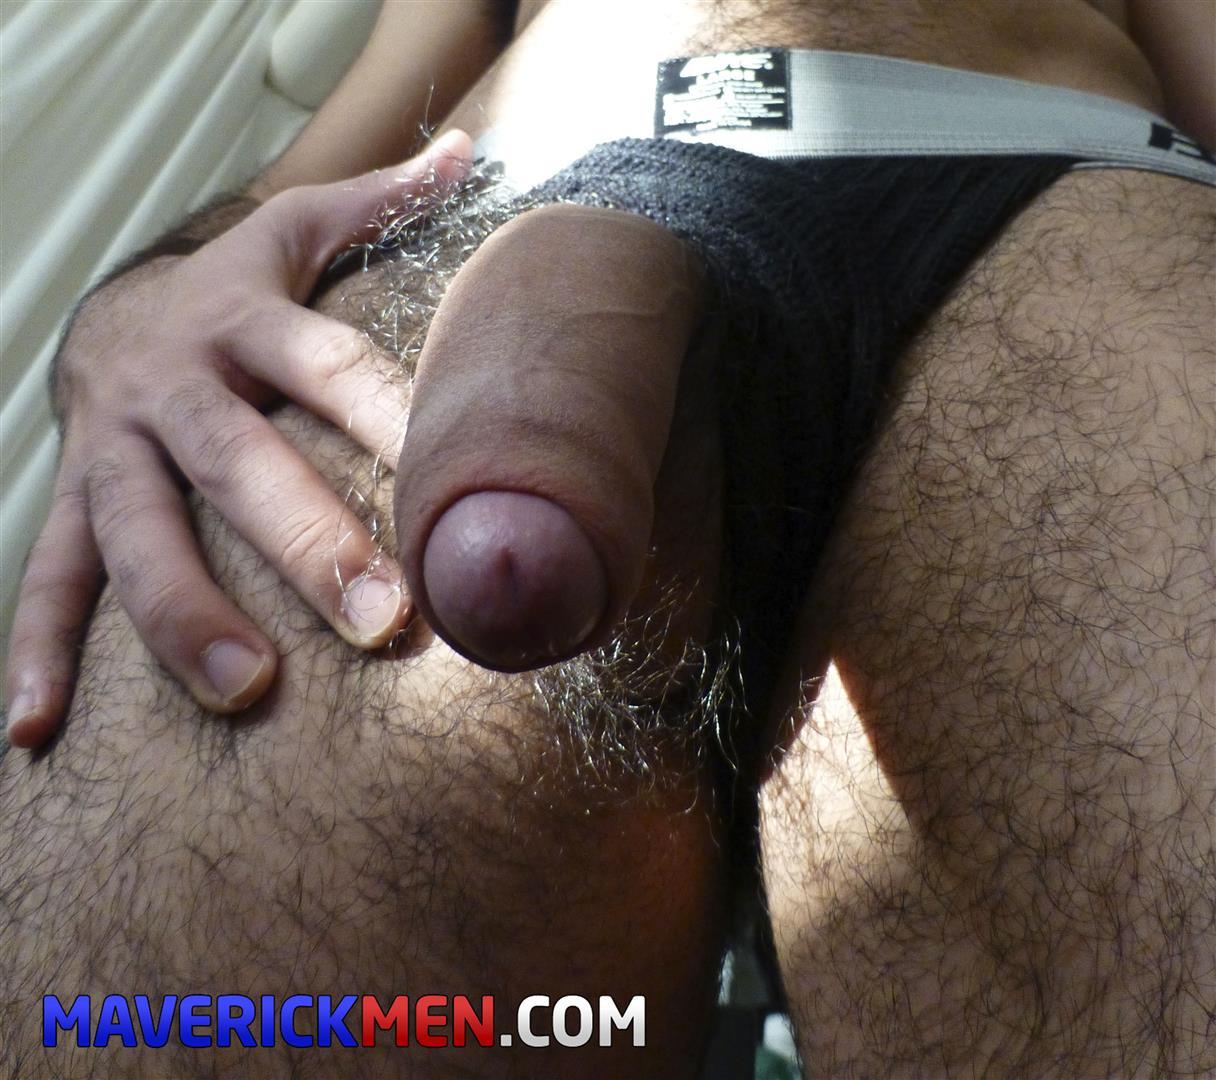 Maverick Men Little Wolf Hairy Ass Guy With A Big Uncut Cock Bareback Amateur Gay Porn 01 Breeding A Young Guy With A Hairy Ass And A Big Uncut Cock